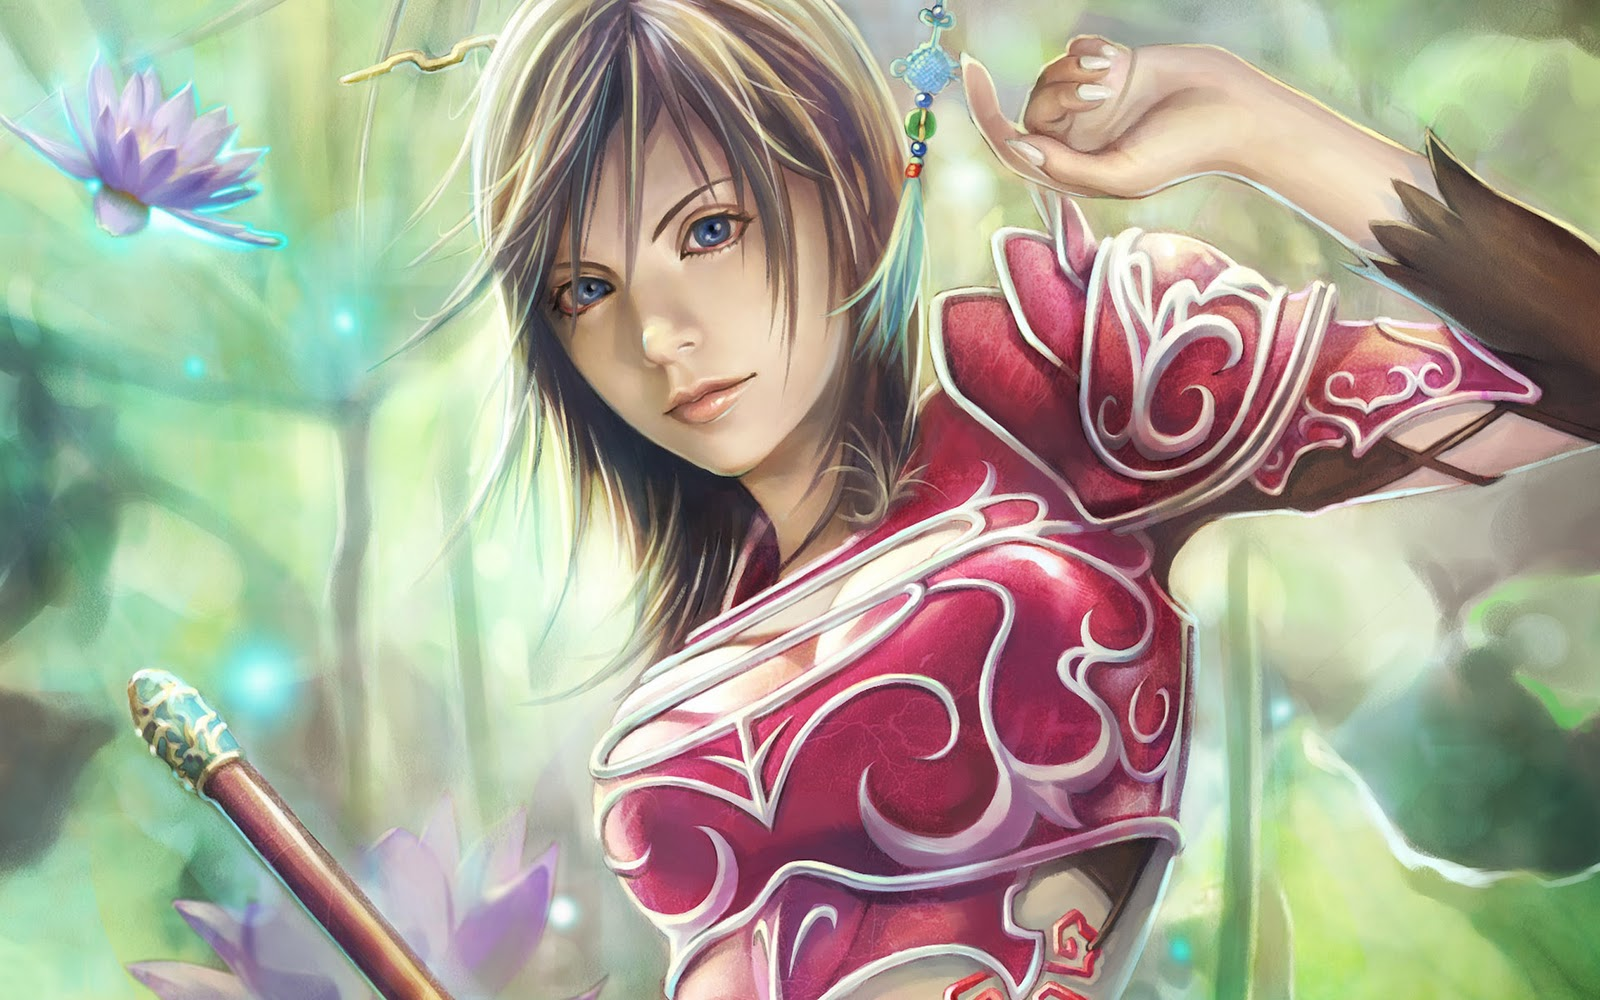 Gorgeous Beauty Female Warrior Anime Girl CG Artwork